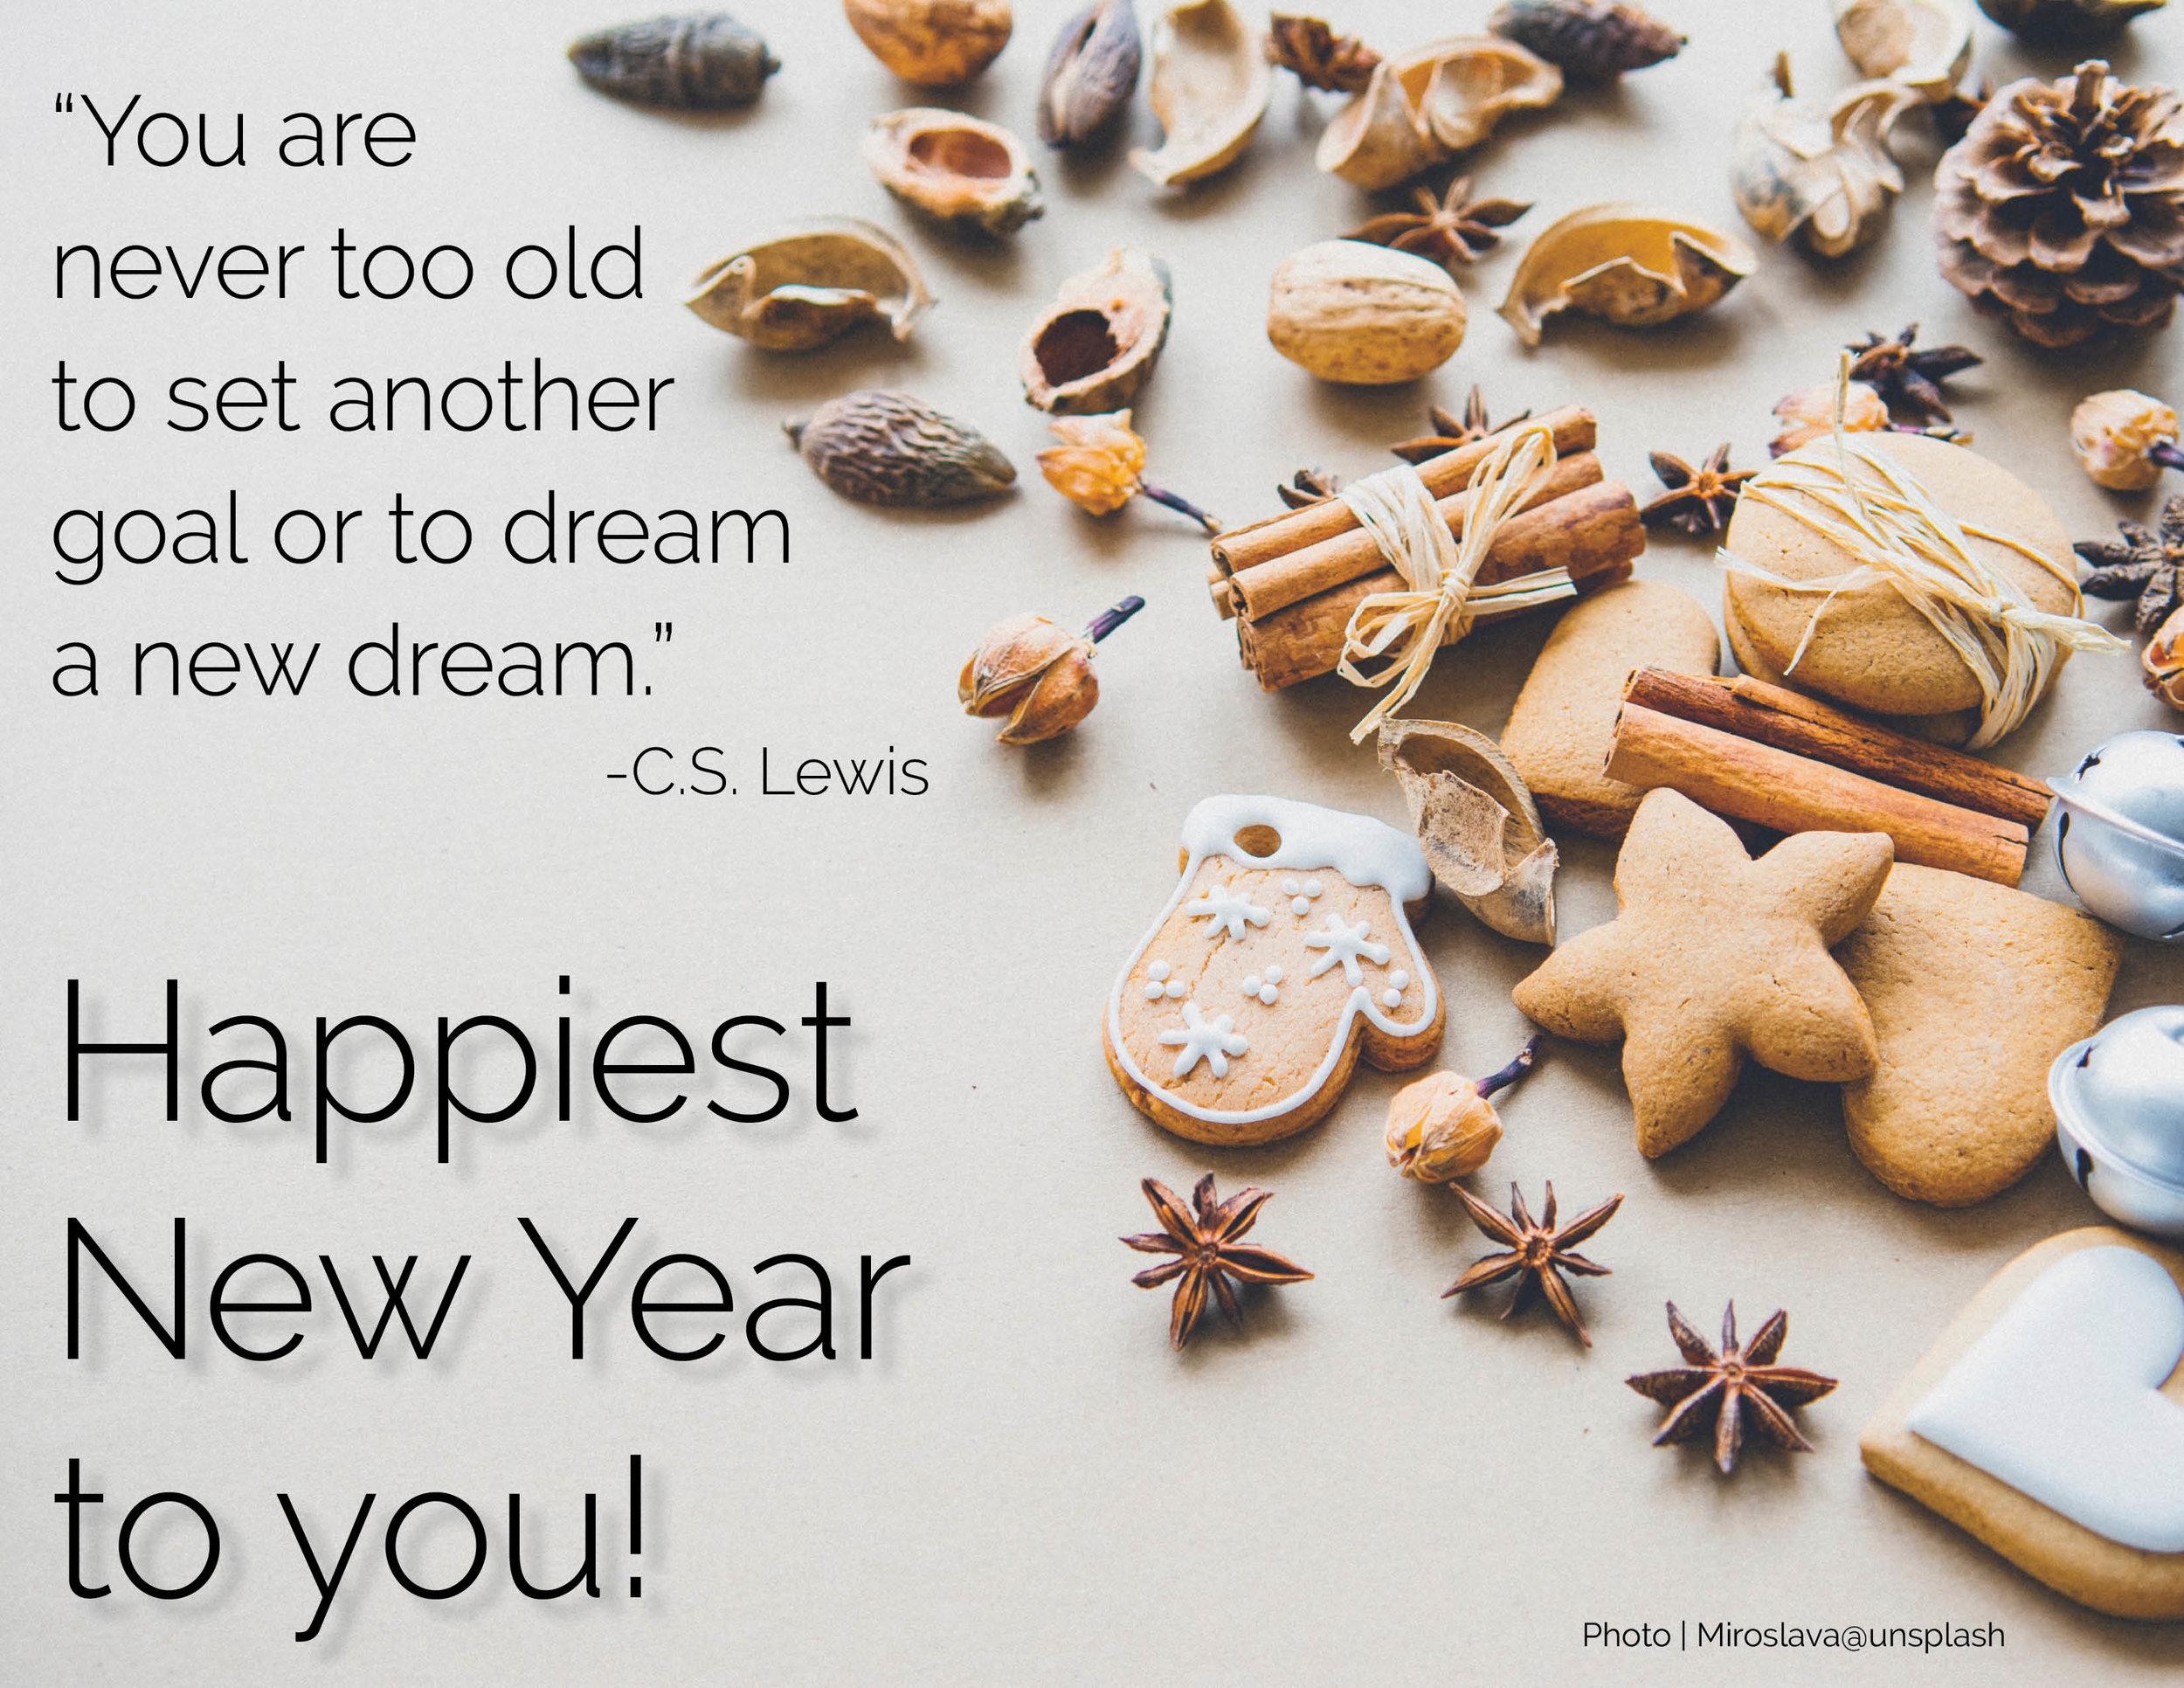 Happy new year quote.jpg